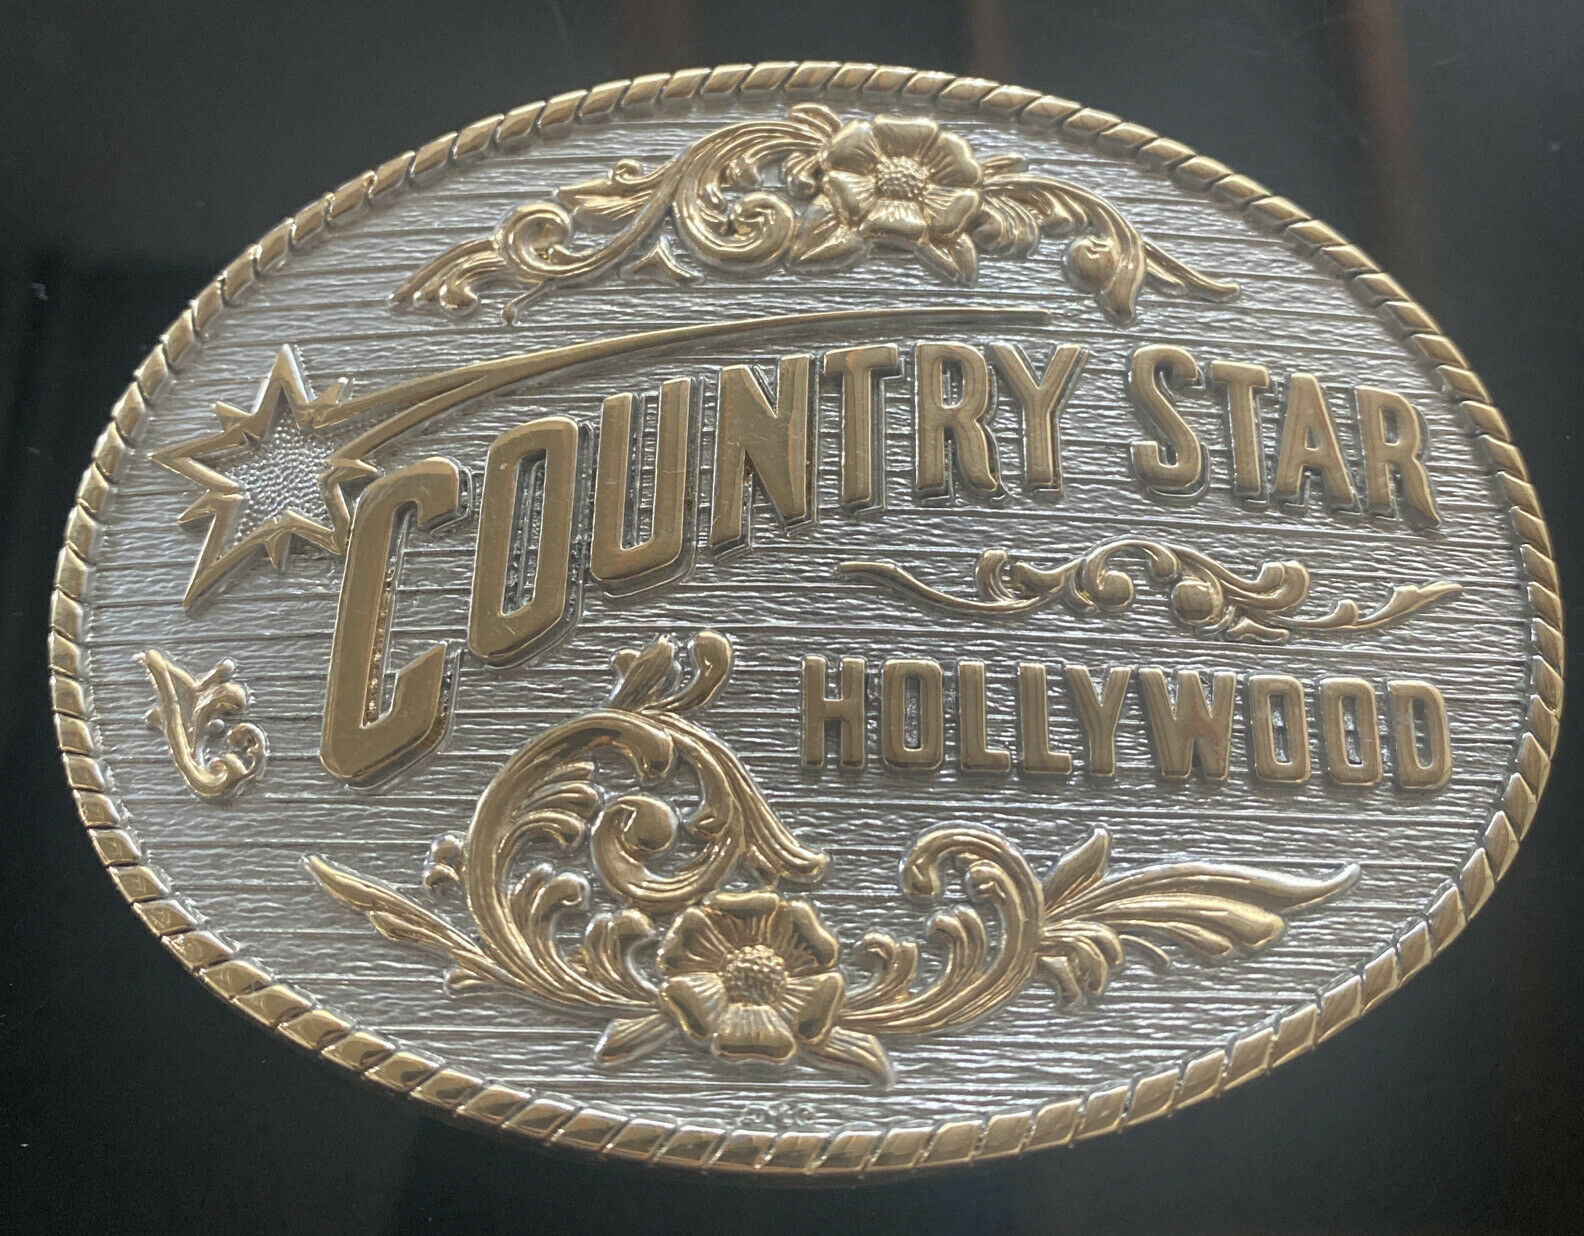 VIntage Riflefire Country Star Hollywood Brass Belt Buckle Award Design Medals